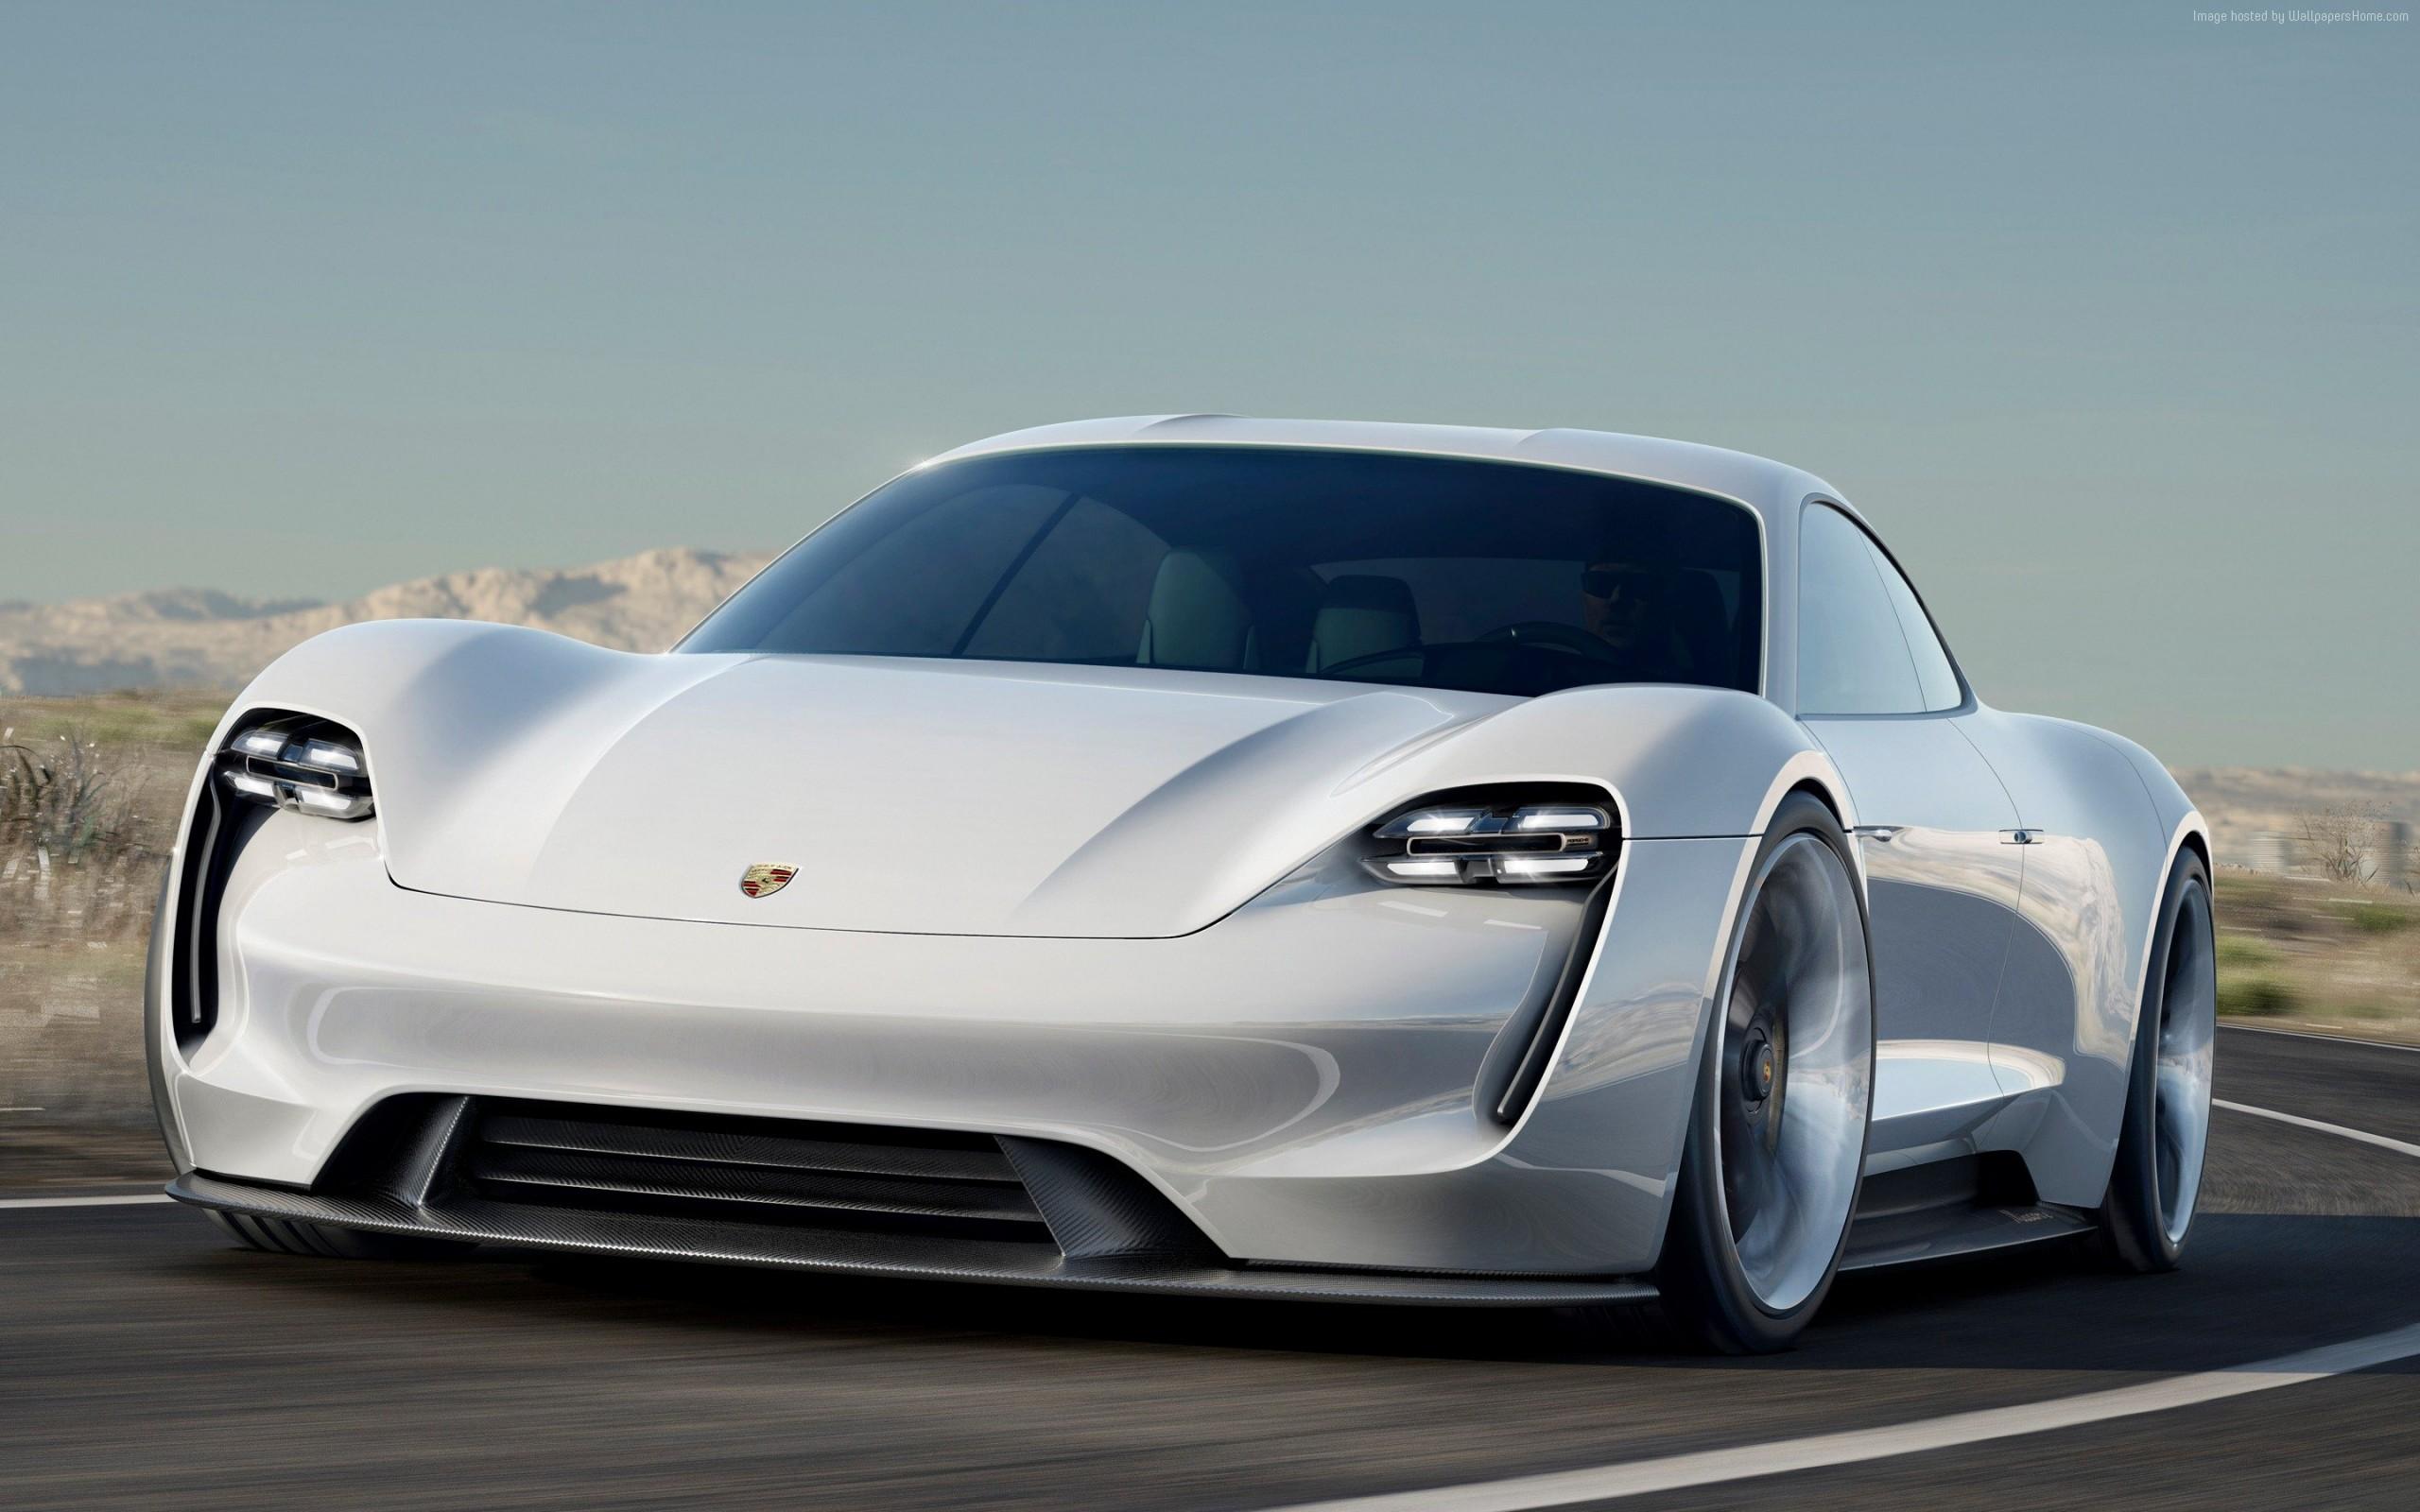 Porsche Taycan Electric Cars SuperCar 800V Wallpaper 2560x1600